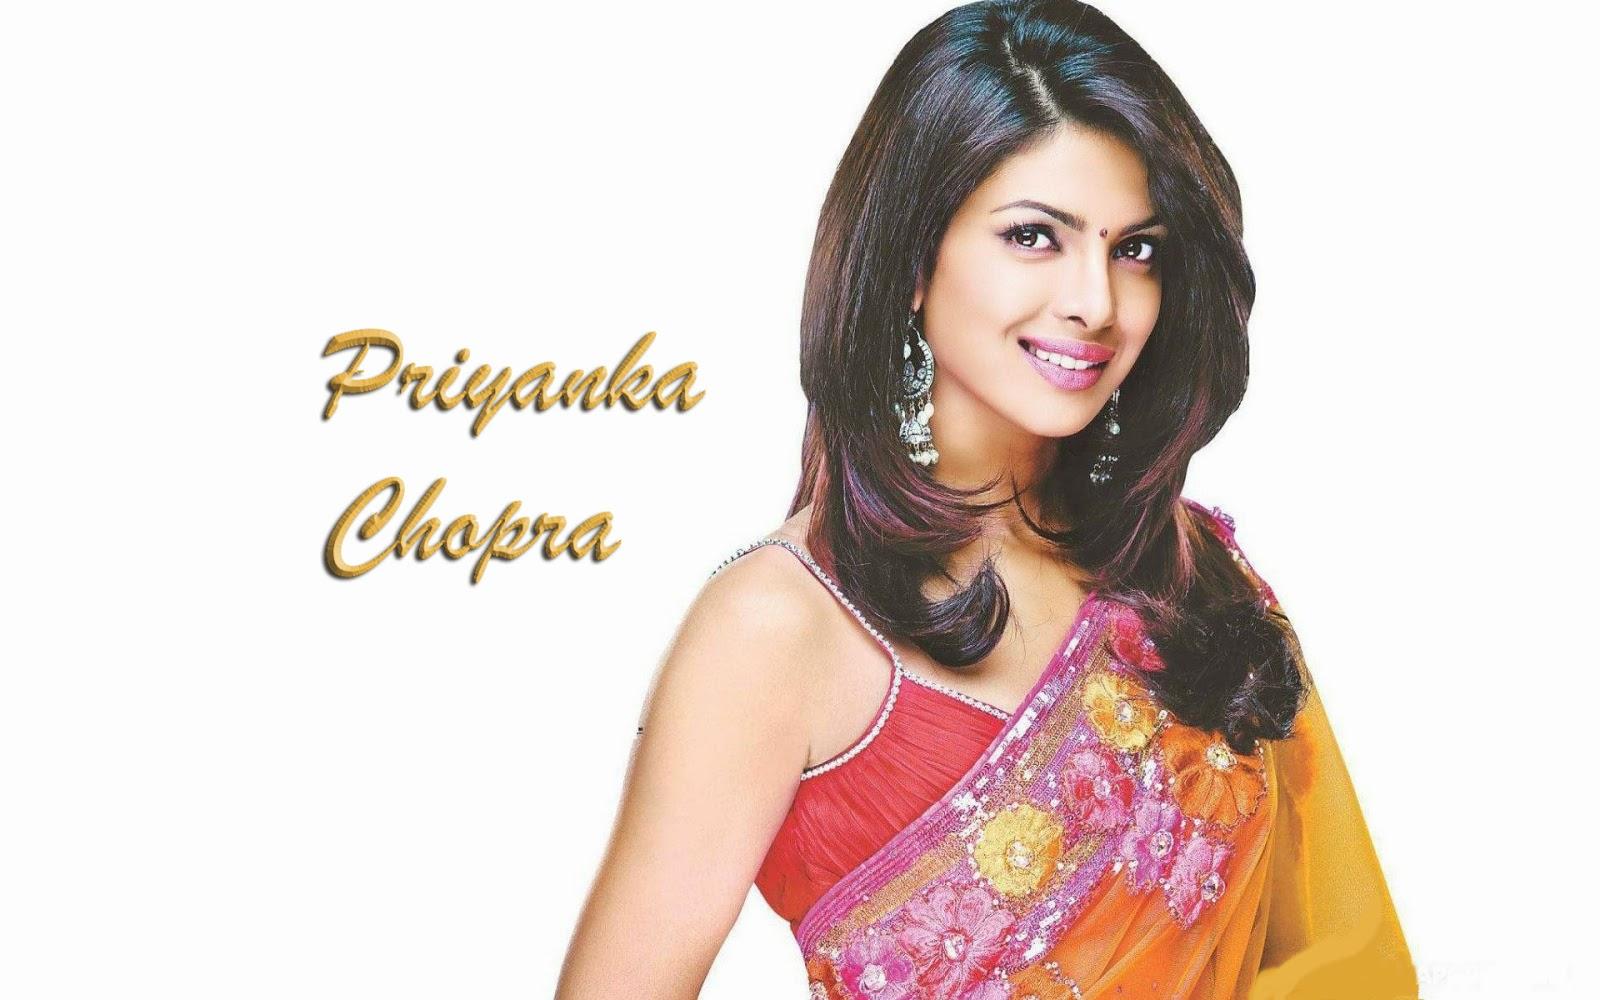 Priyanka Chopra images wallpapers photos pics download Priyanka